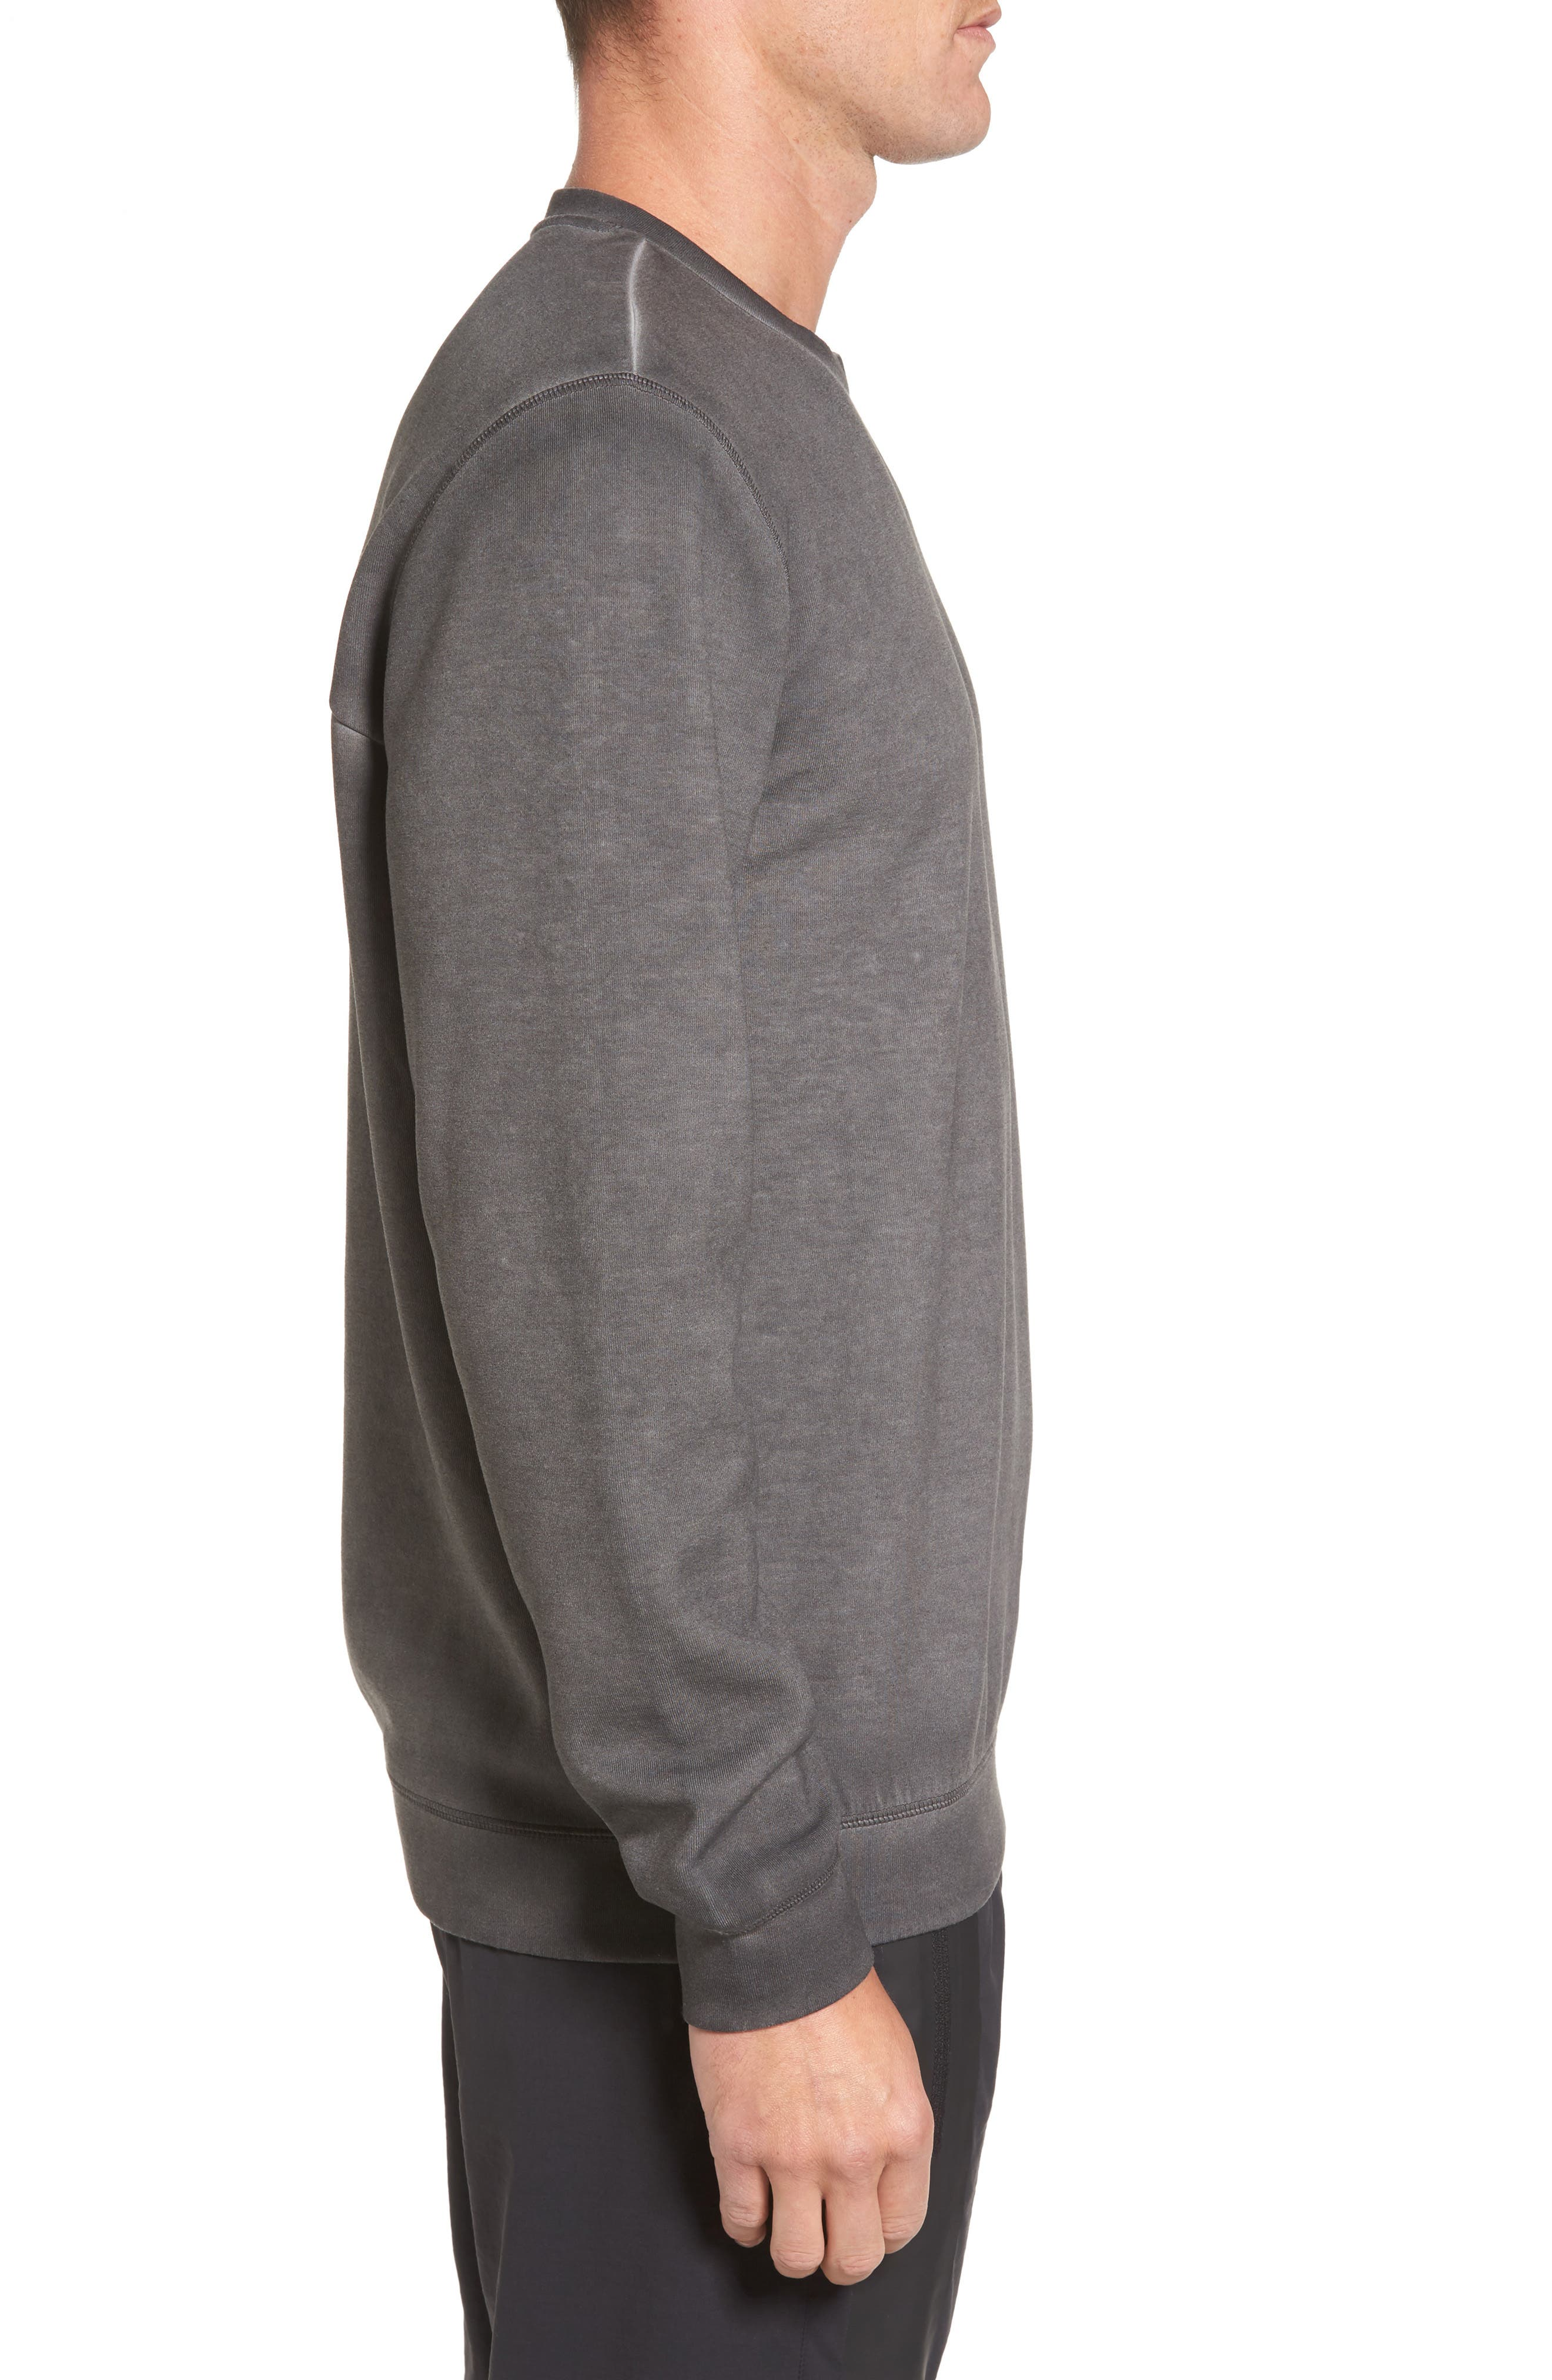 Dirty Wash Sweatshirt,                             Alternate thumbnail 3, color,                             040